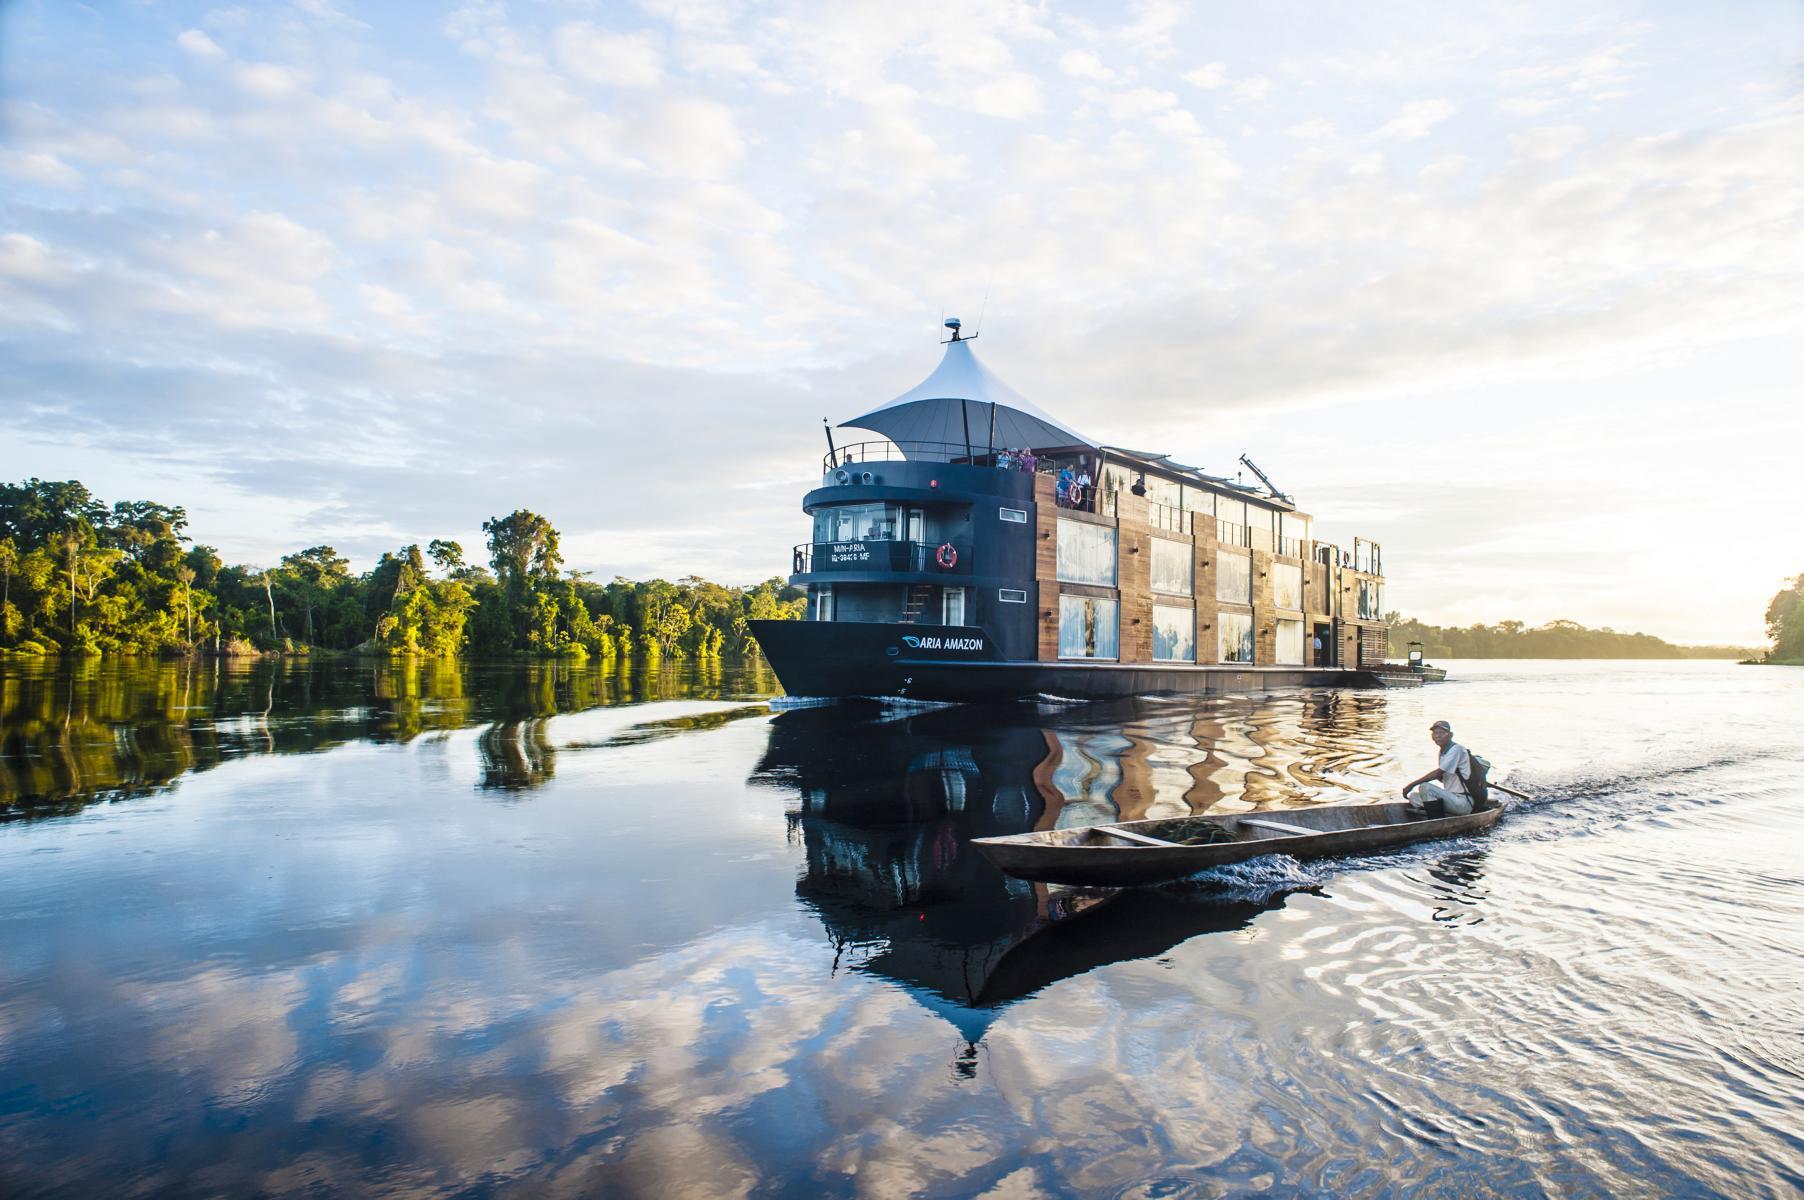 Die Aria Amazon auf dem Amazonas